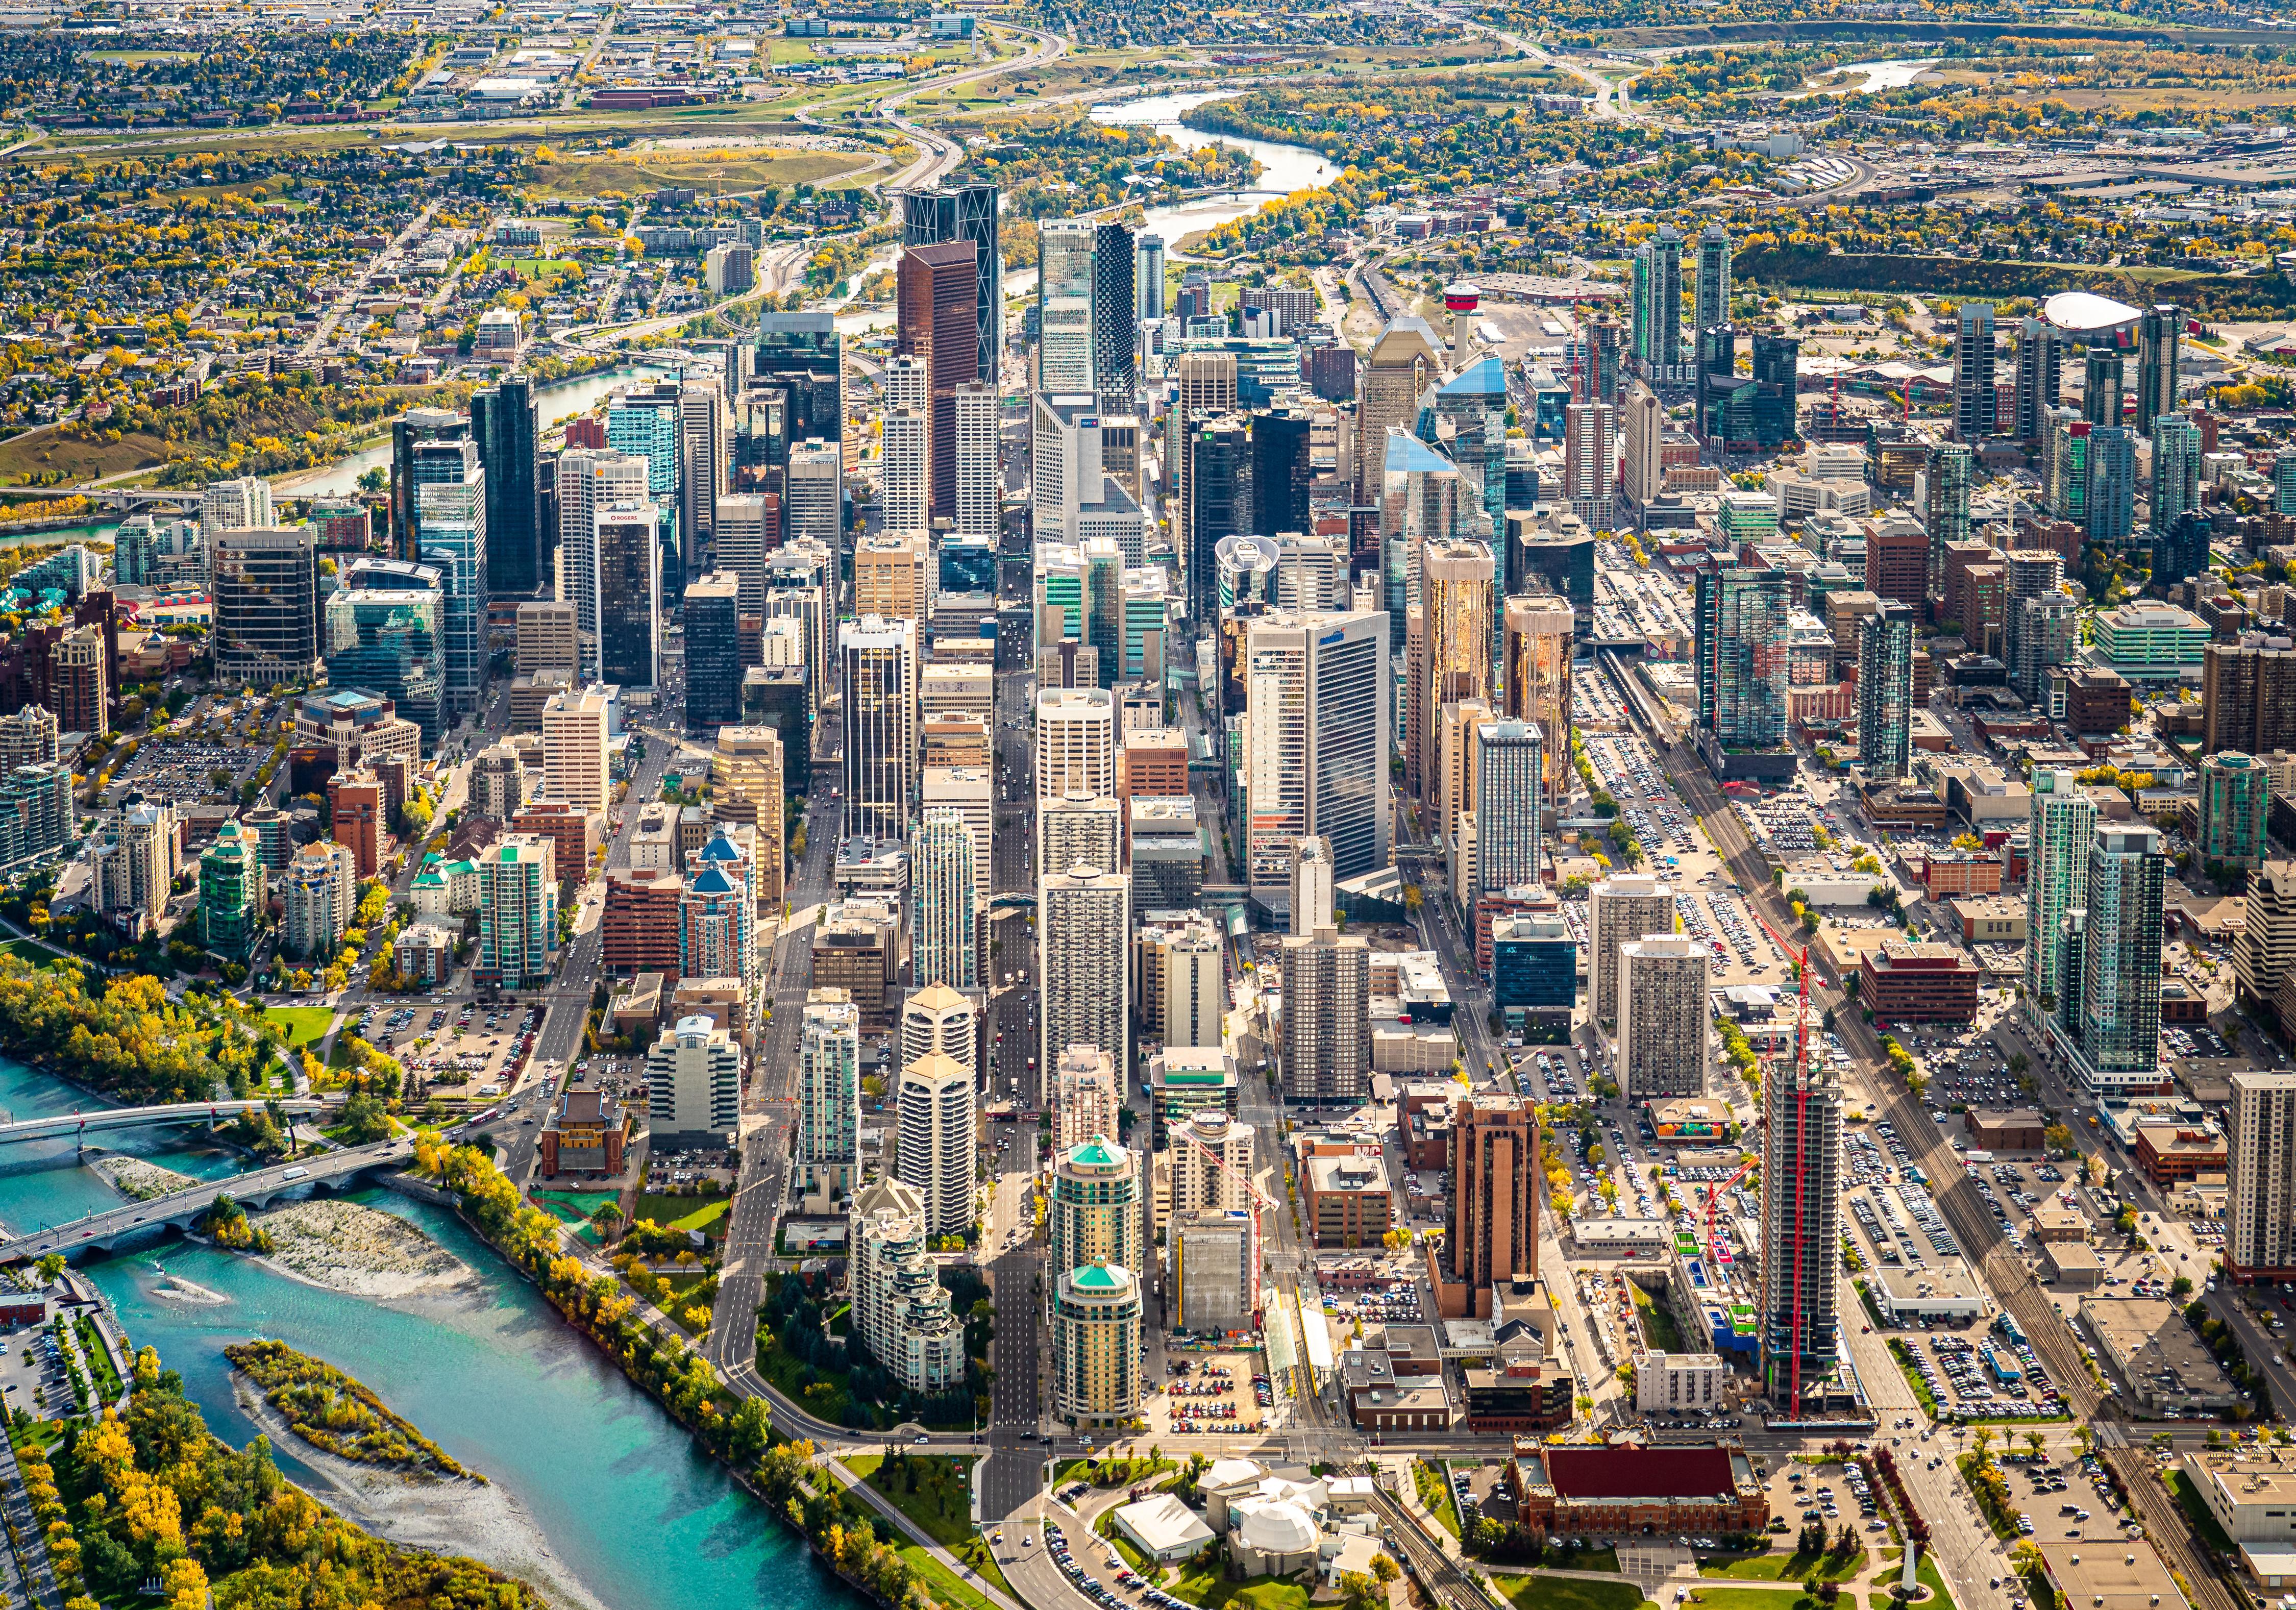 Looking down 6th Ave, Calgary, Alberta, Canada